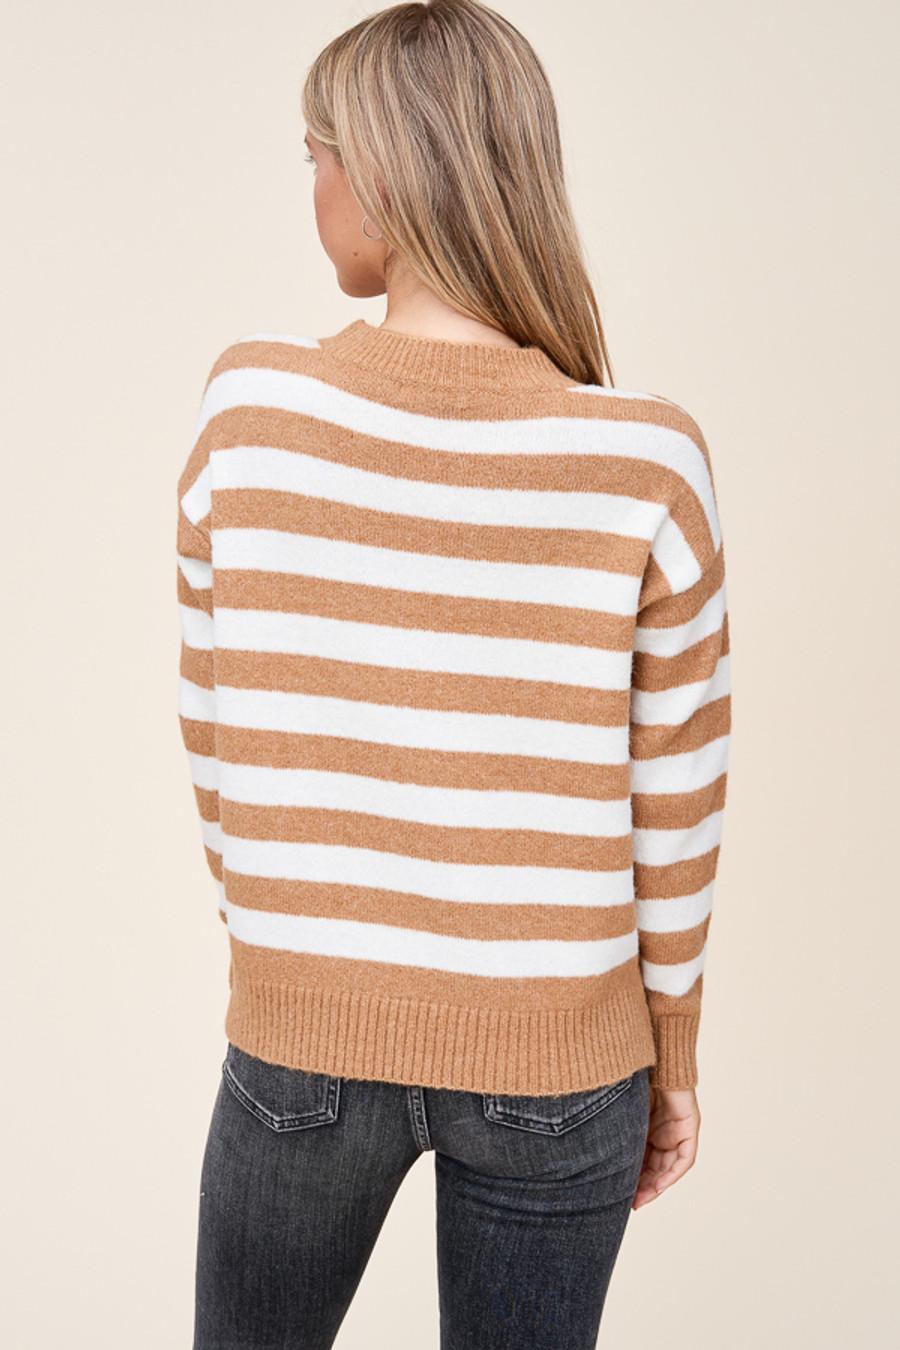 Staccato Striped Sweater